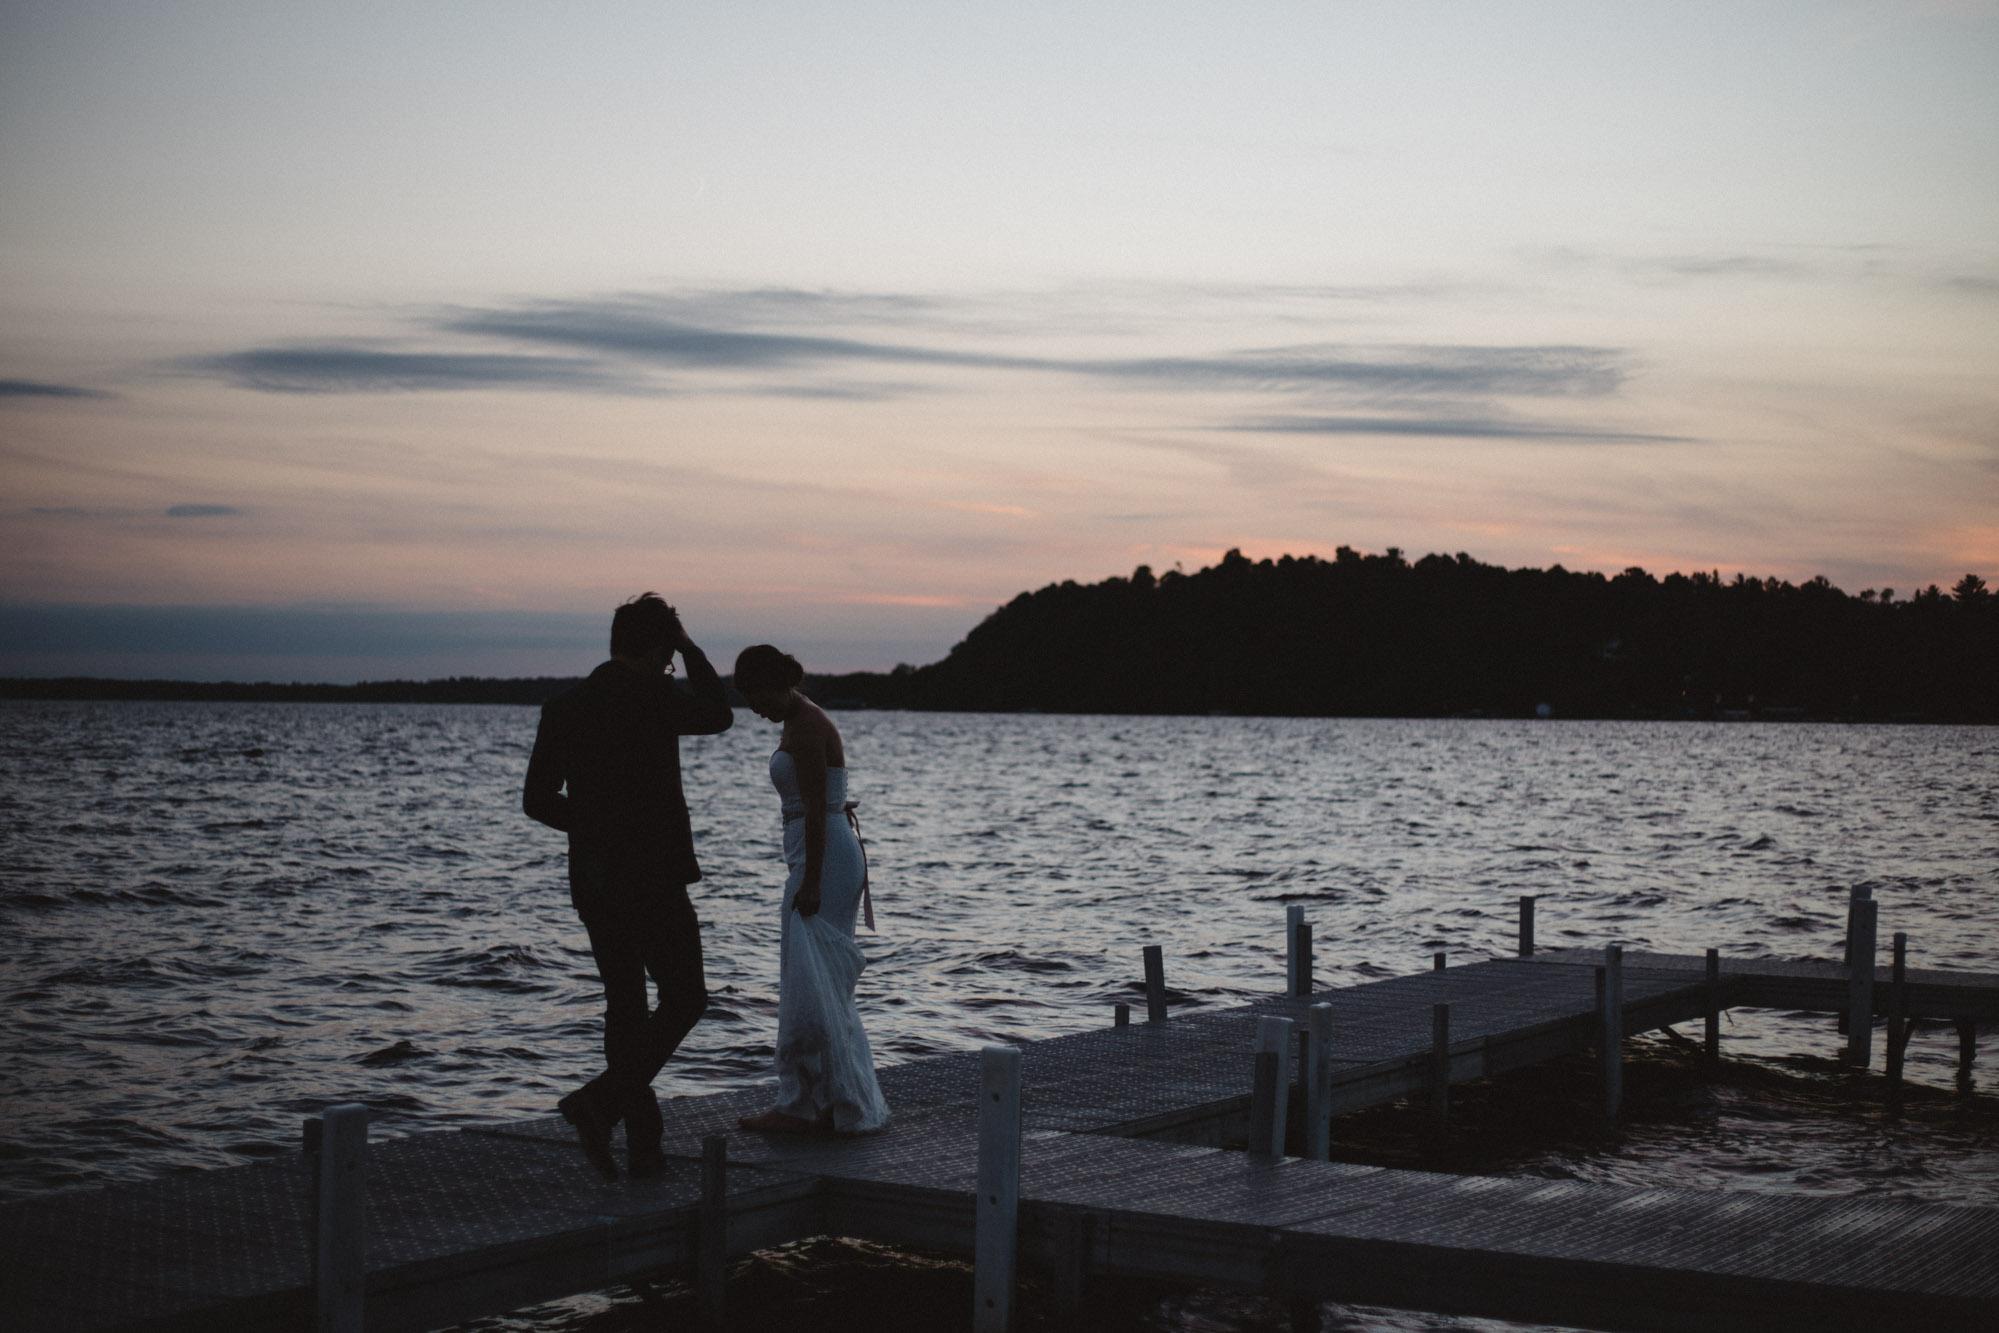 Artistic, moody, wedding photography on Gull Lake at Grand View Lodge in Nisswa Minnesota by Britt DeZeeuw